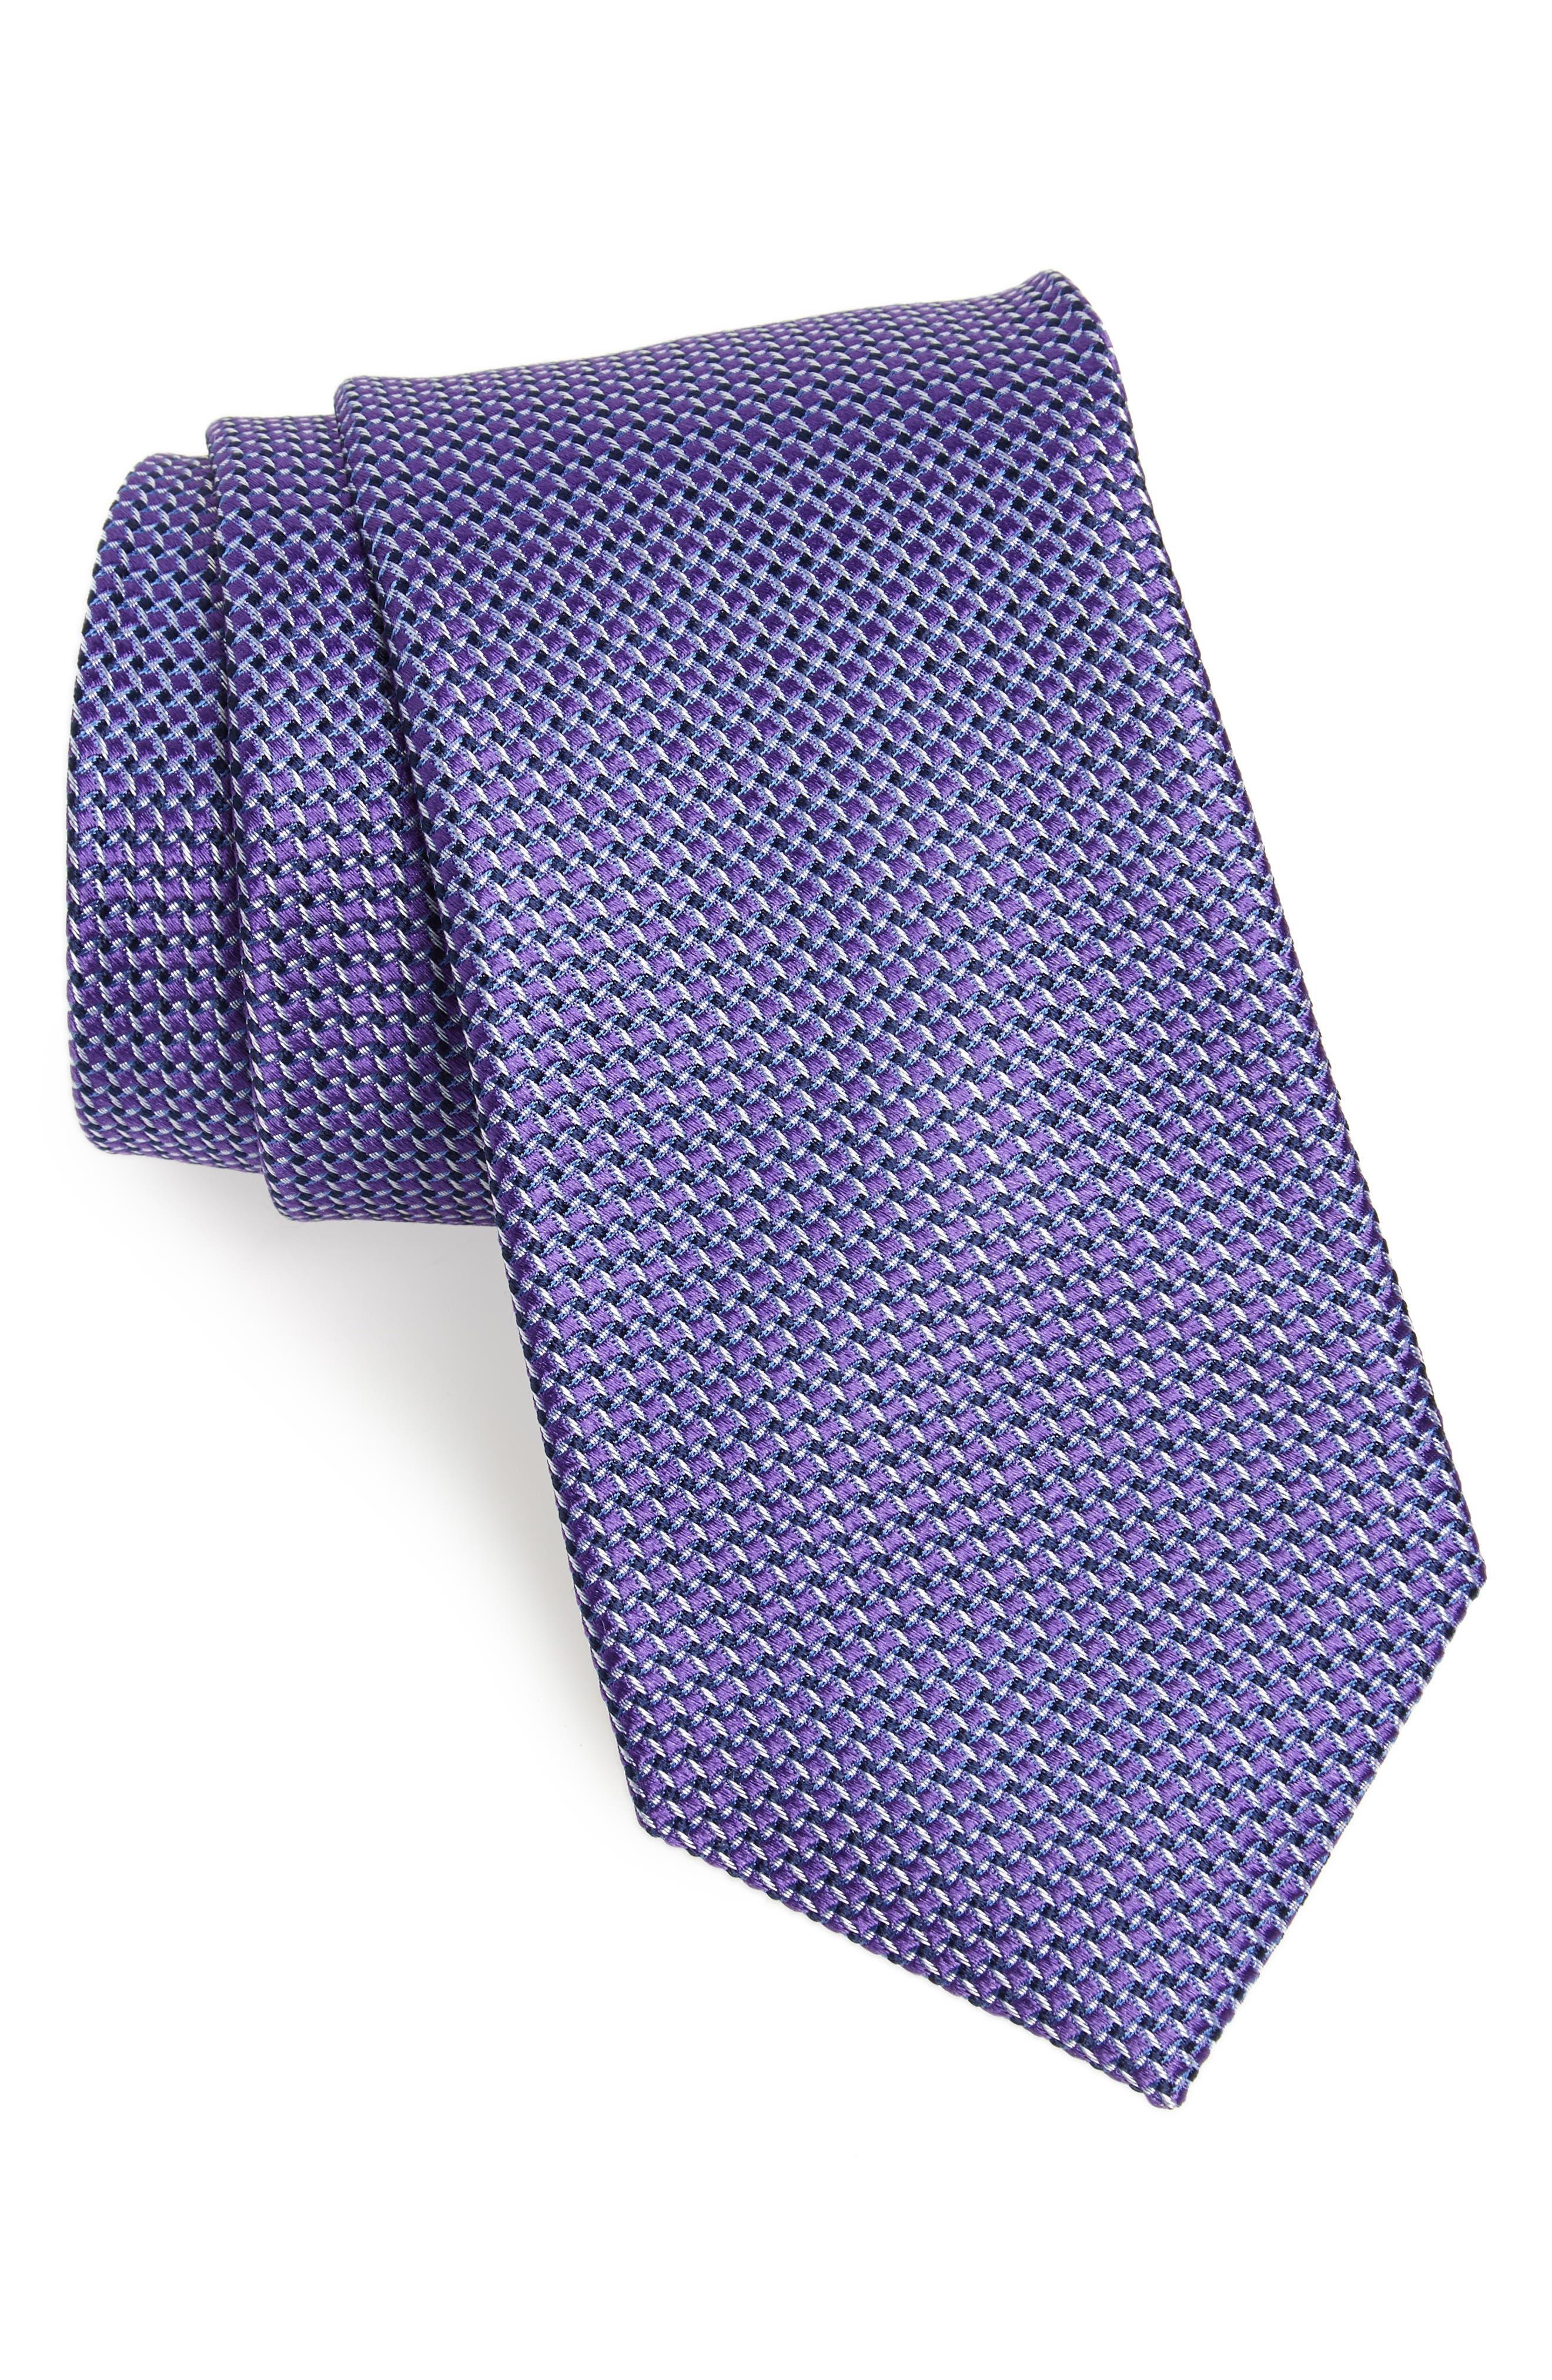 Russo Geo Print Silk Tie,                             Main thumbnail 1, color,                             Purple